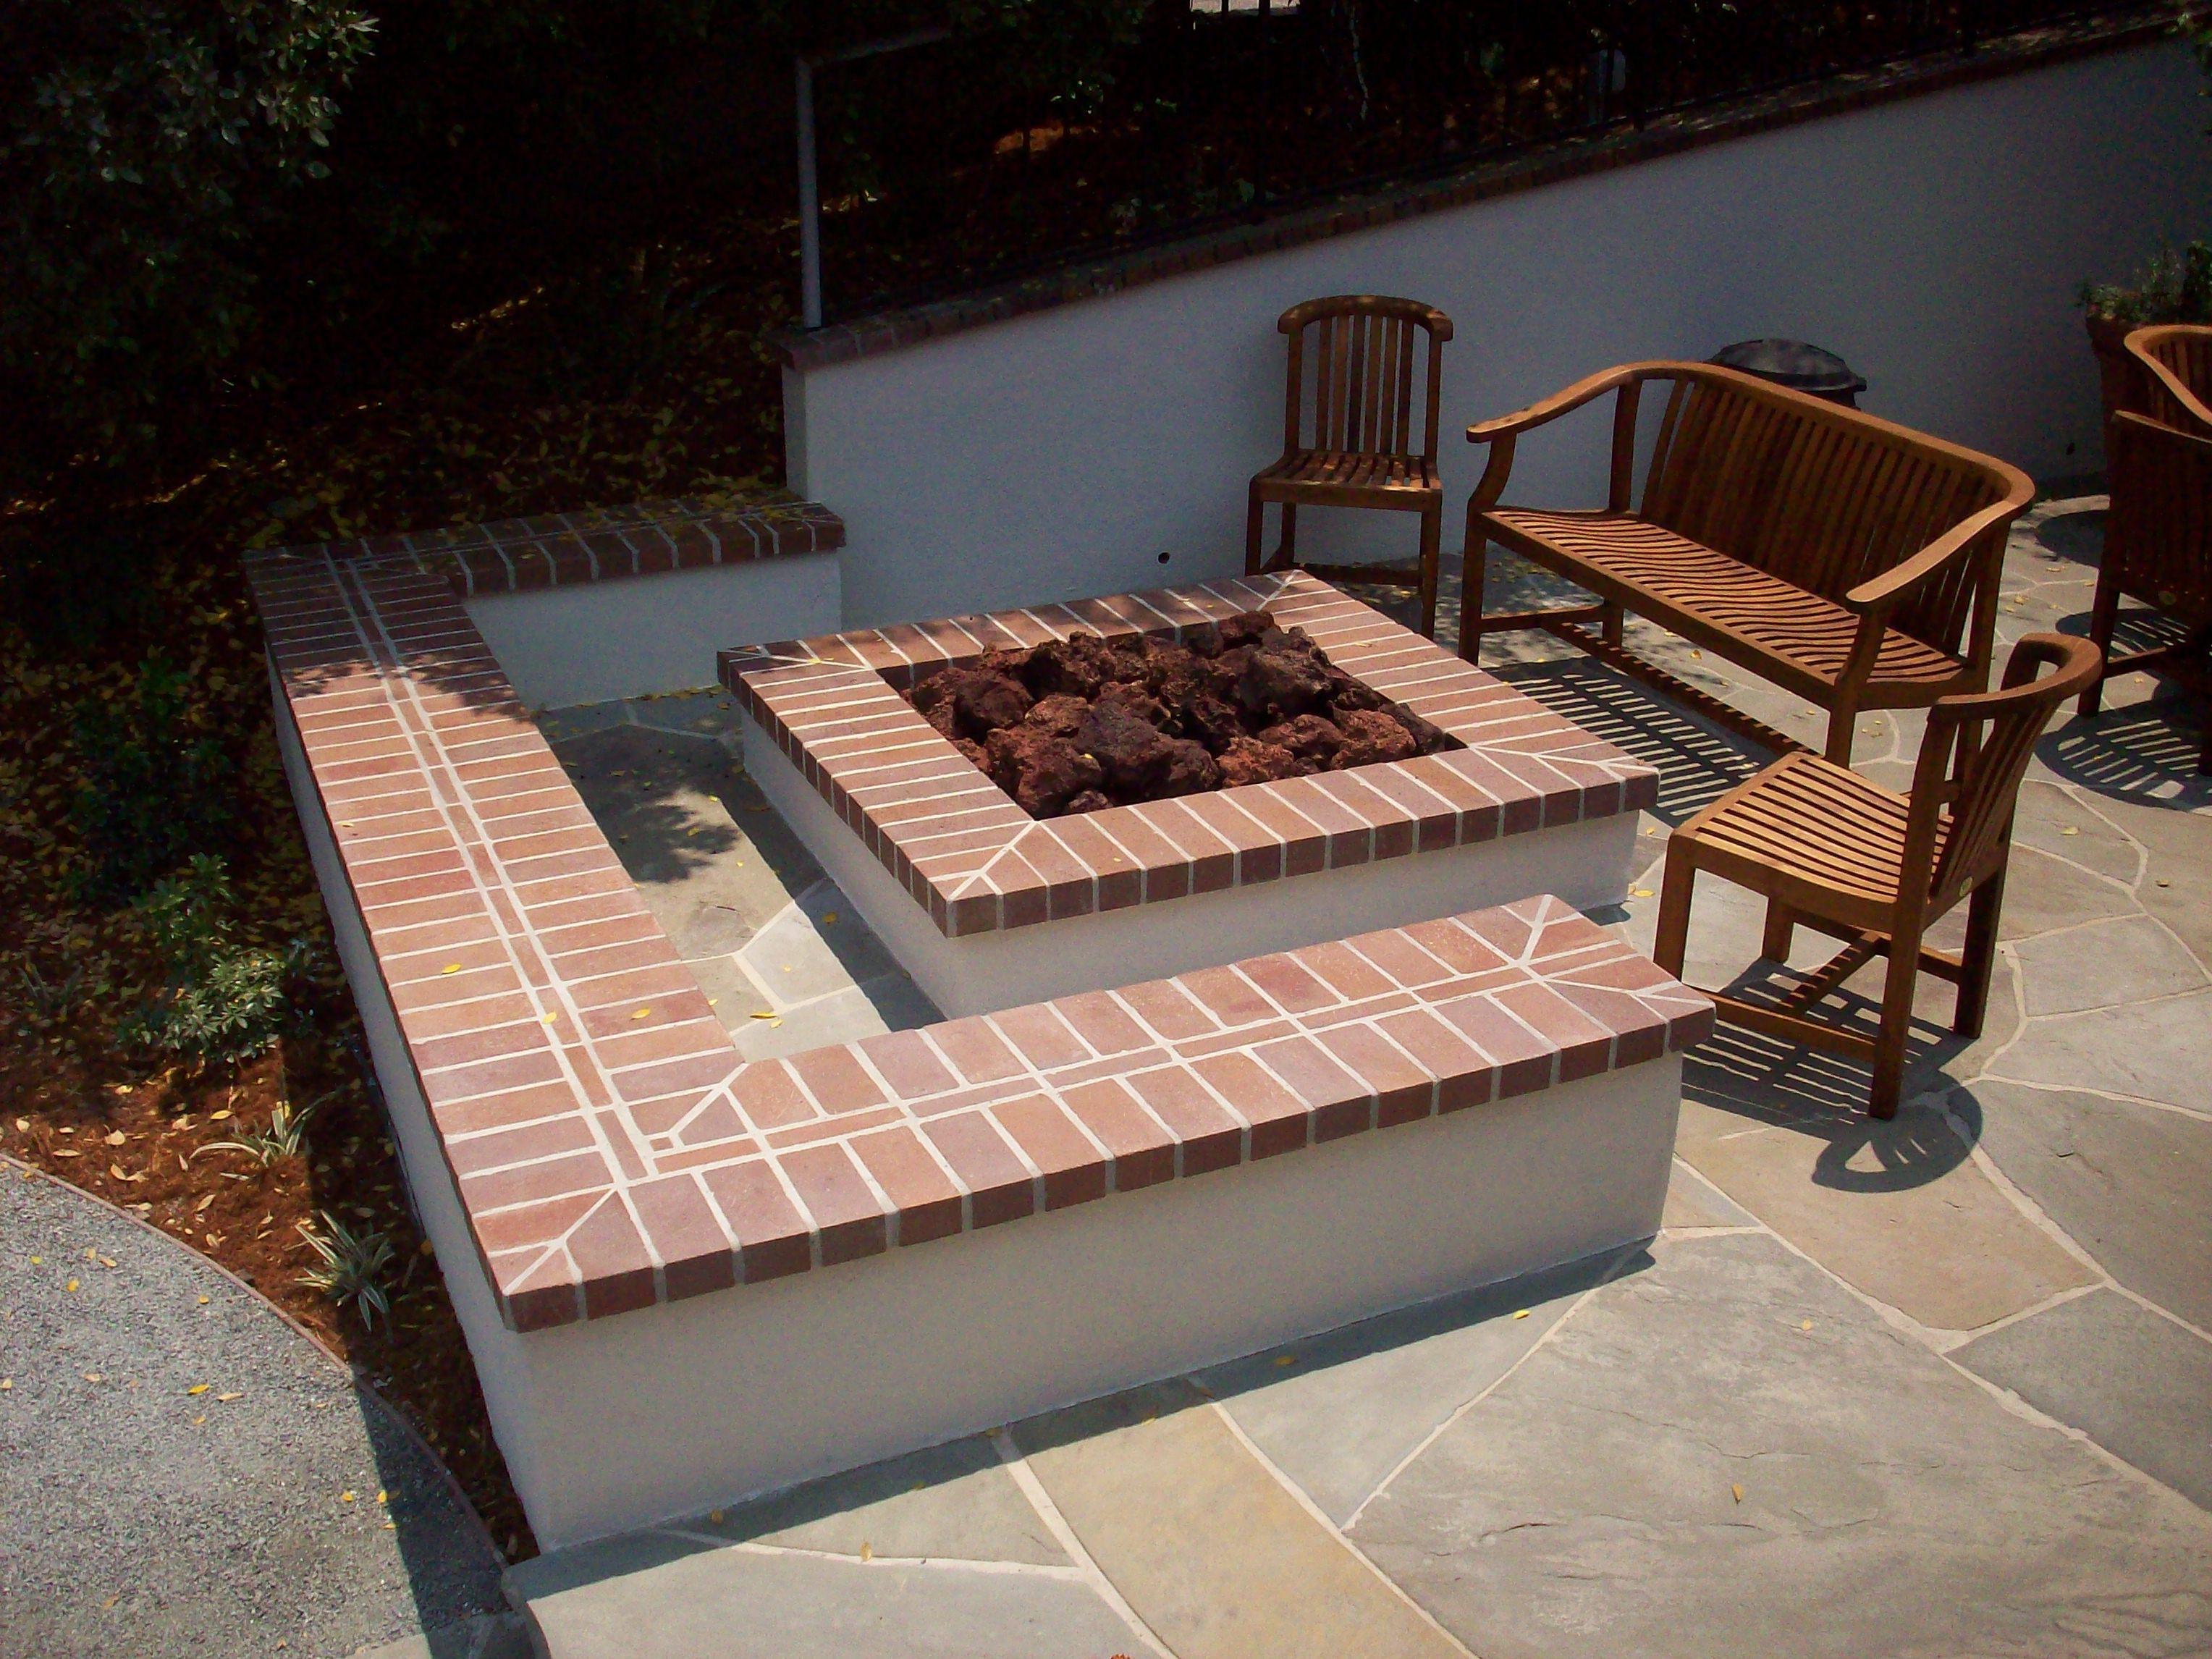 Backyard Brick Fire Pit Ideas